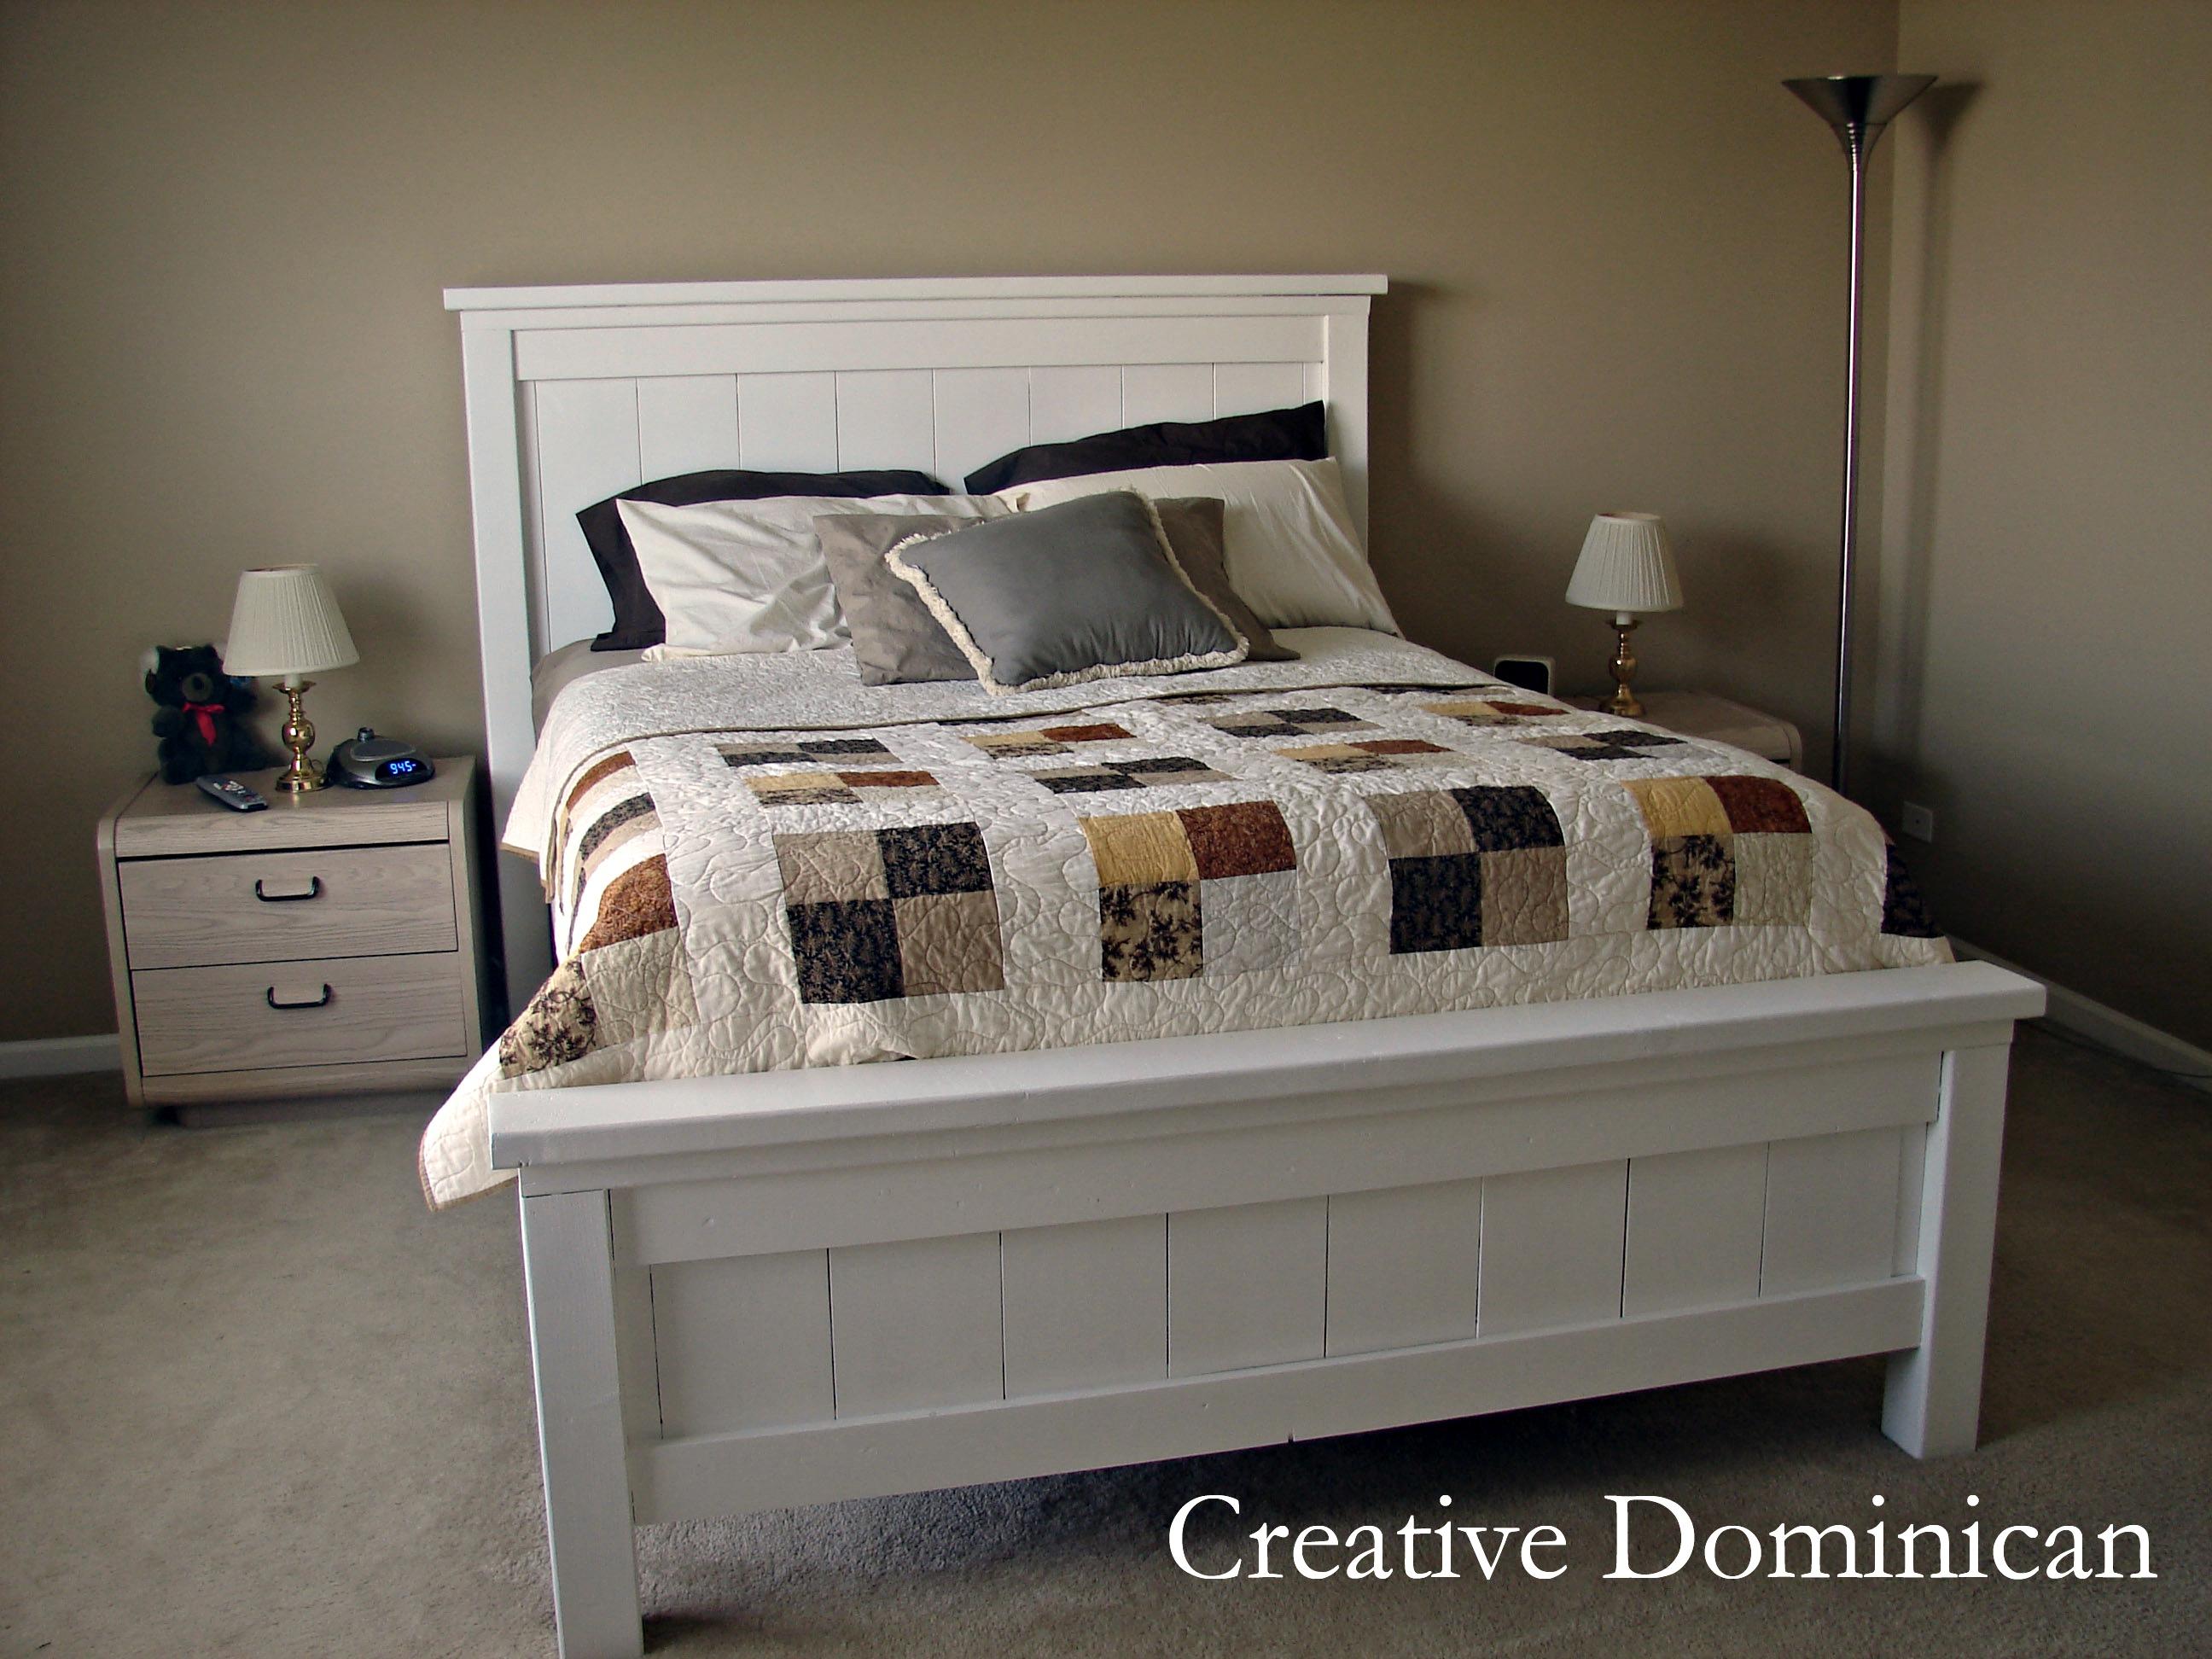 Diy farmhouse bed creative dominican for Farmhouse bed frame plans